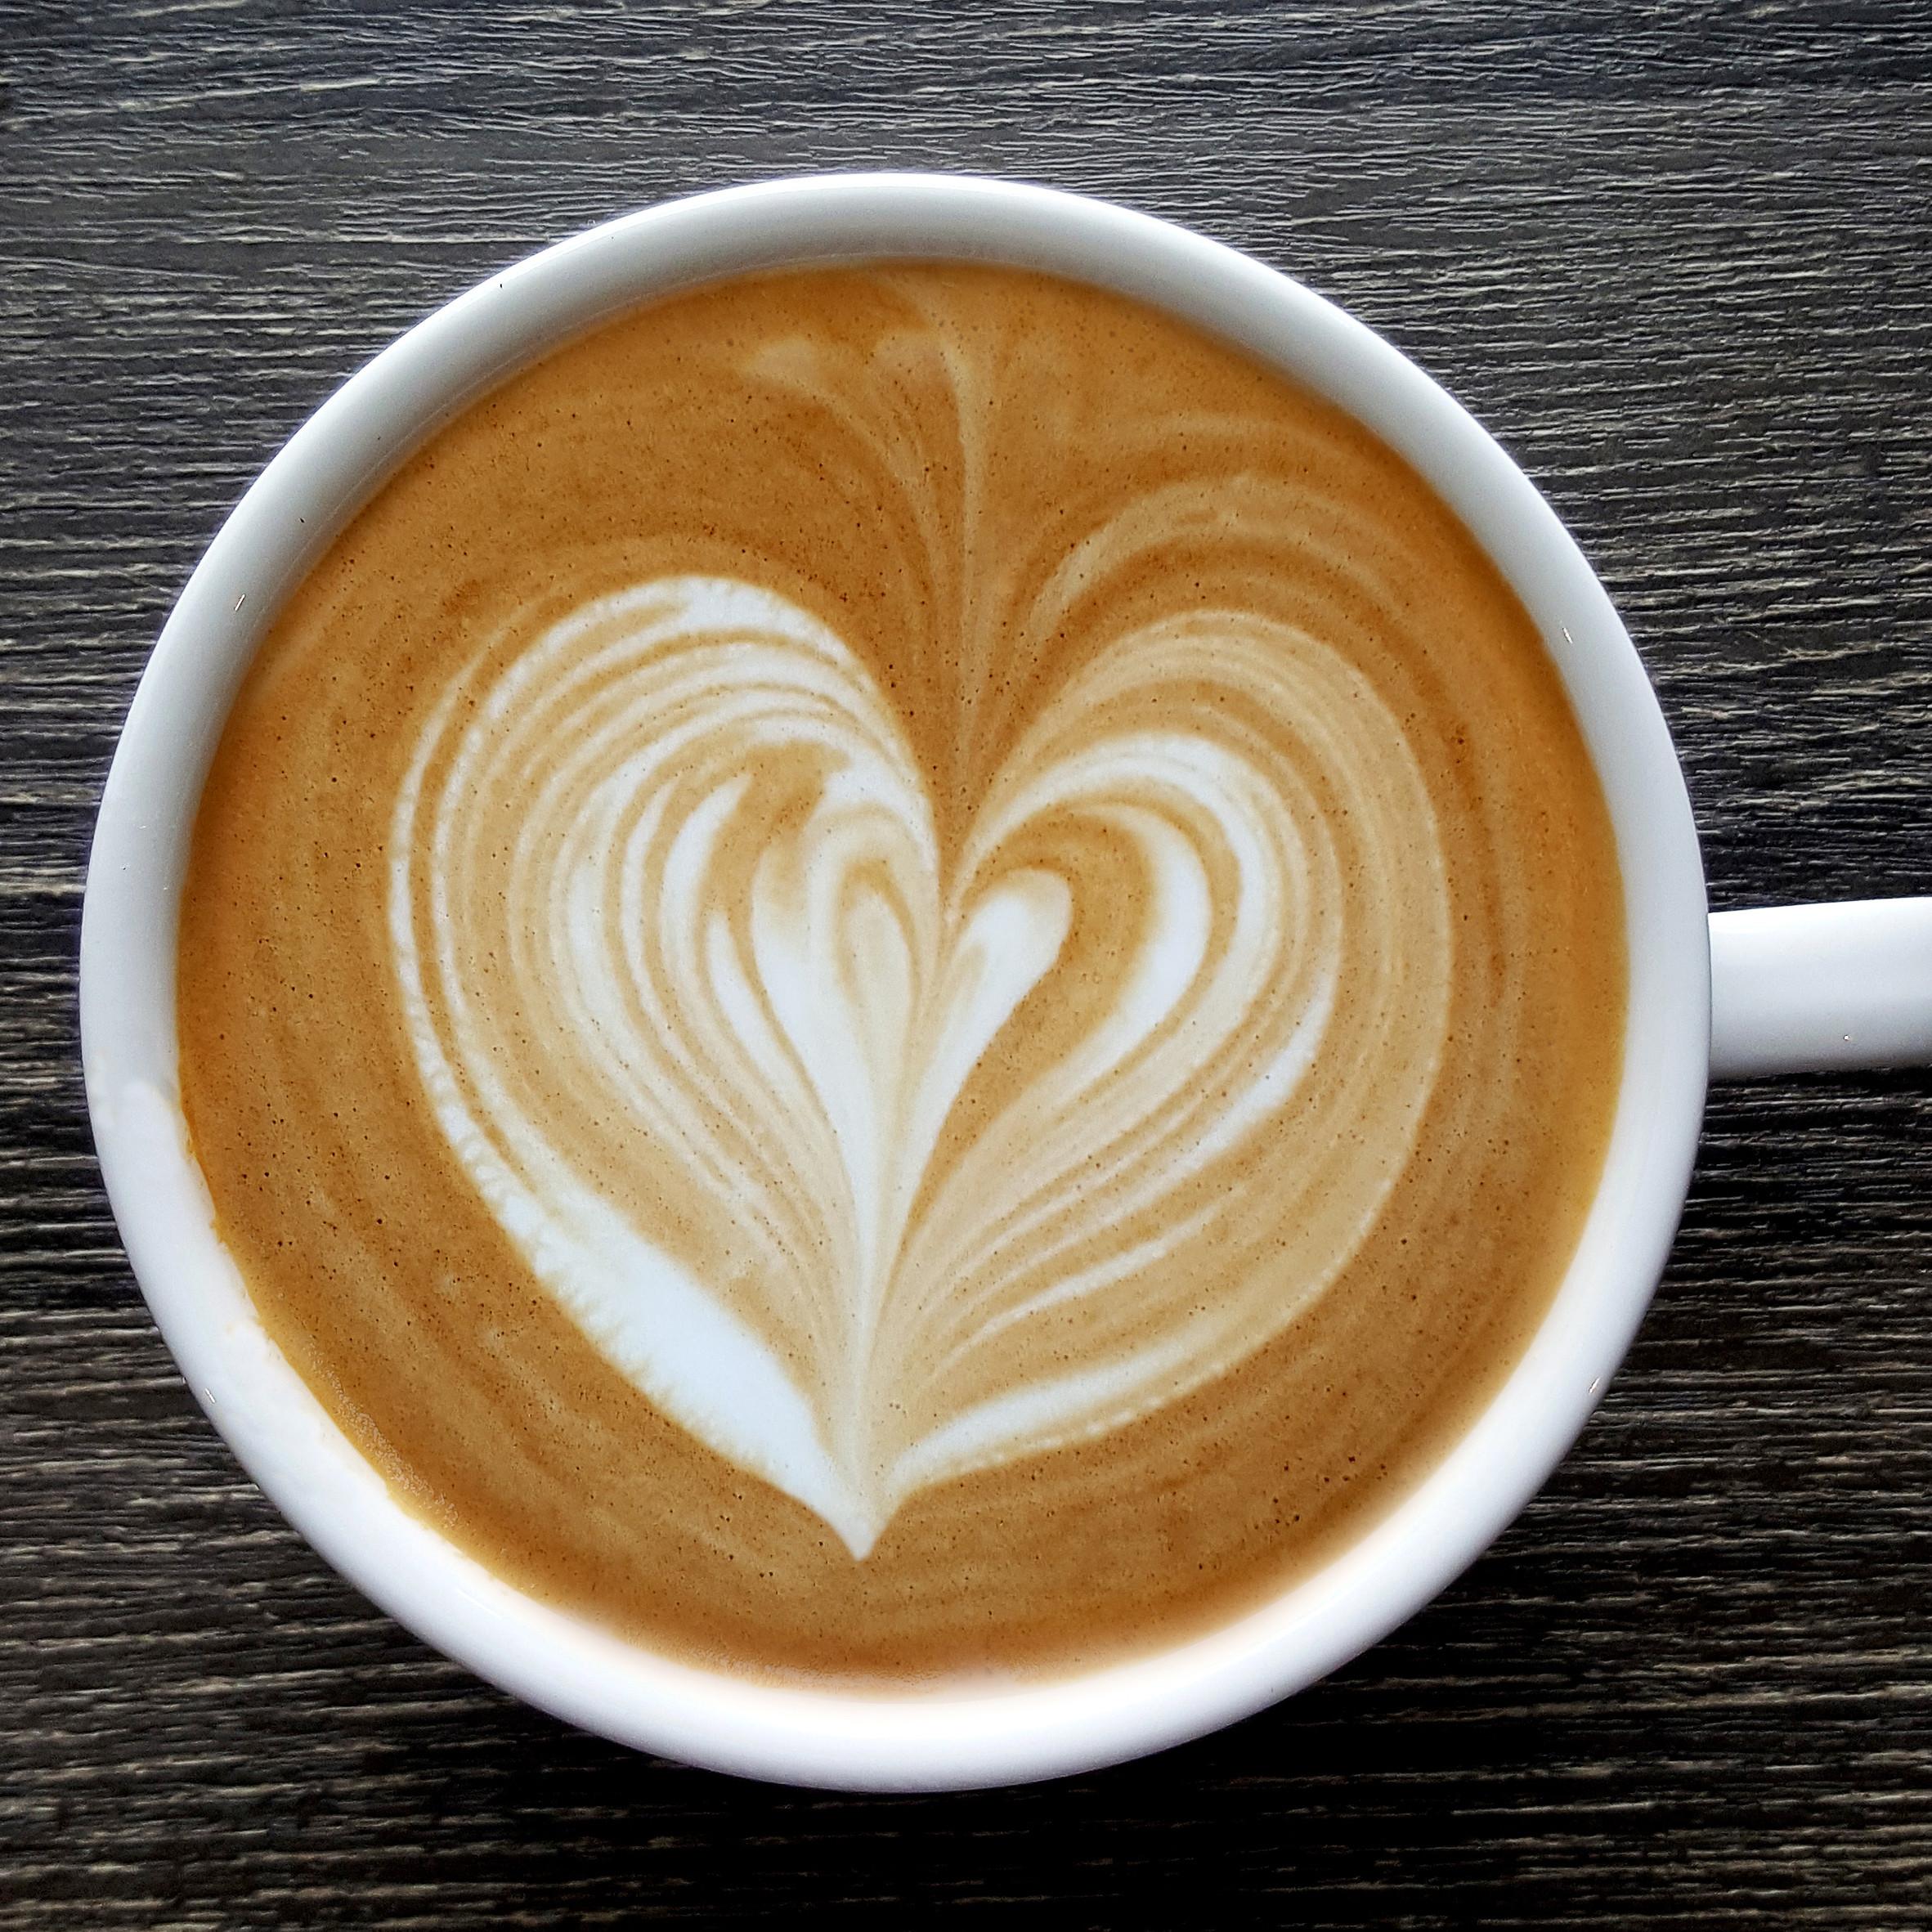 Sapp Coffee Shop